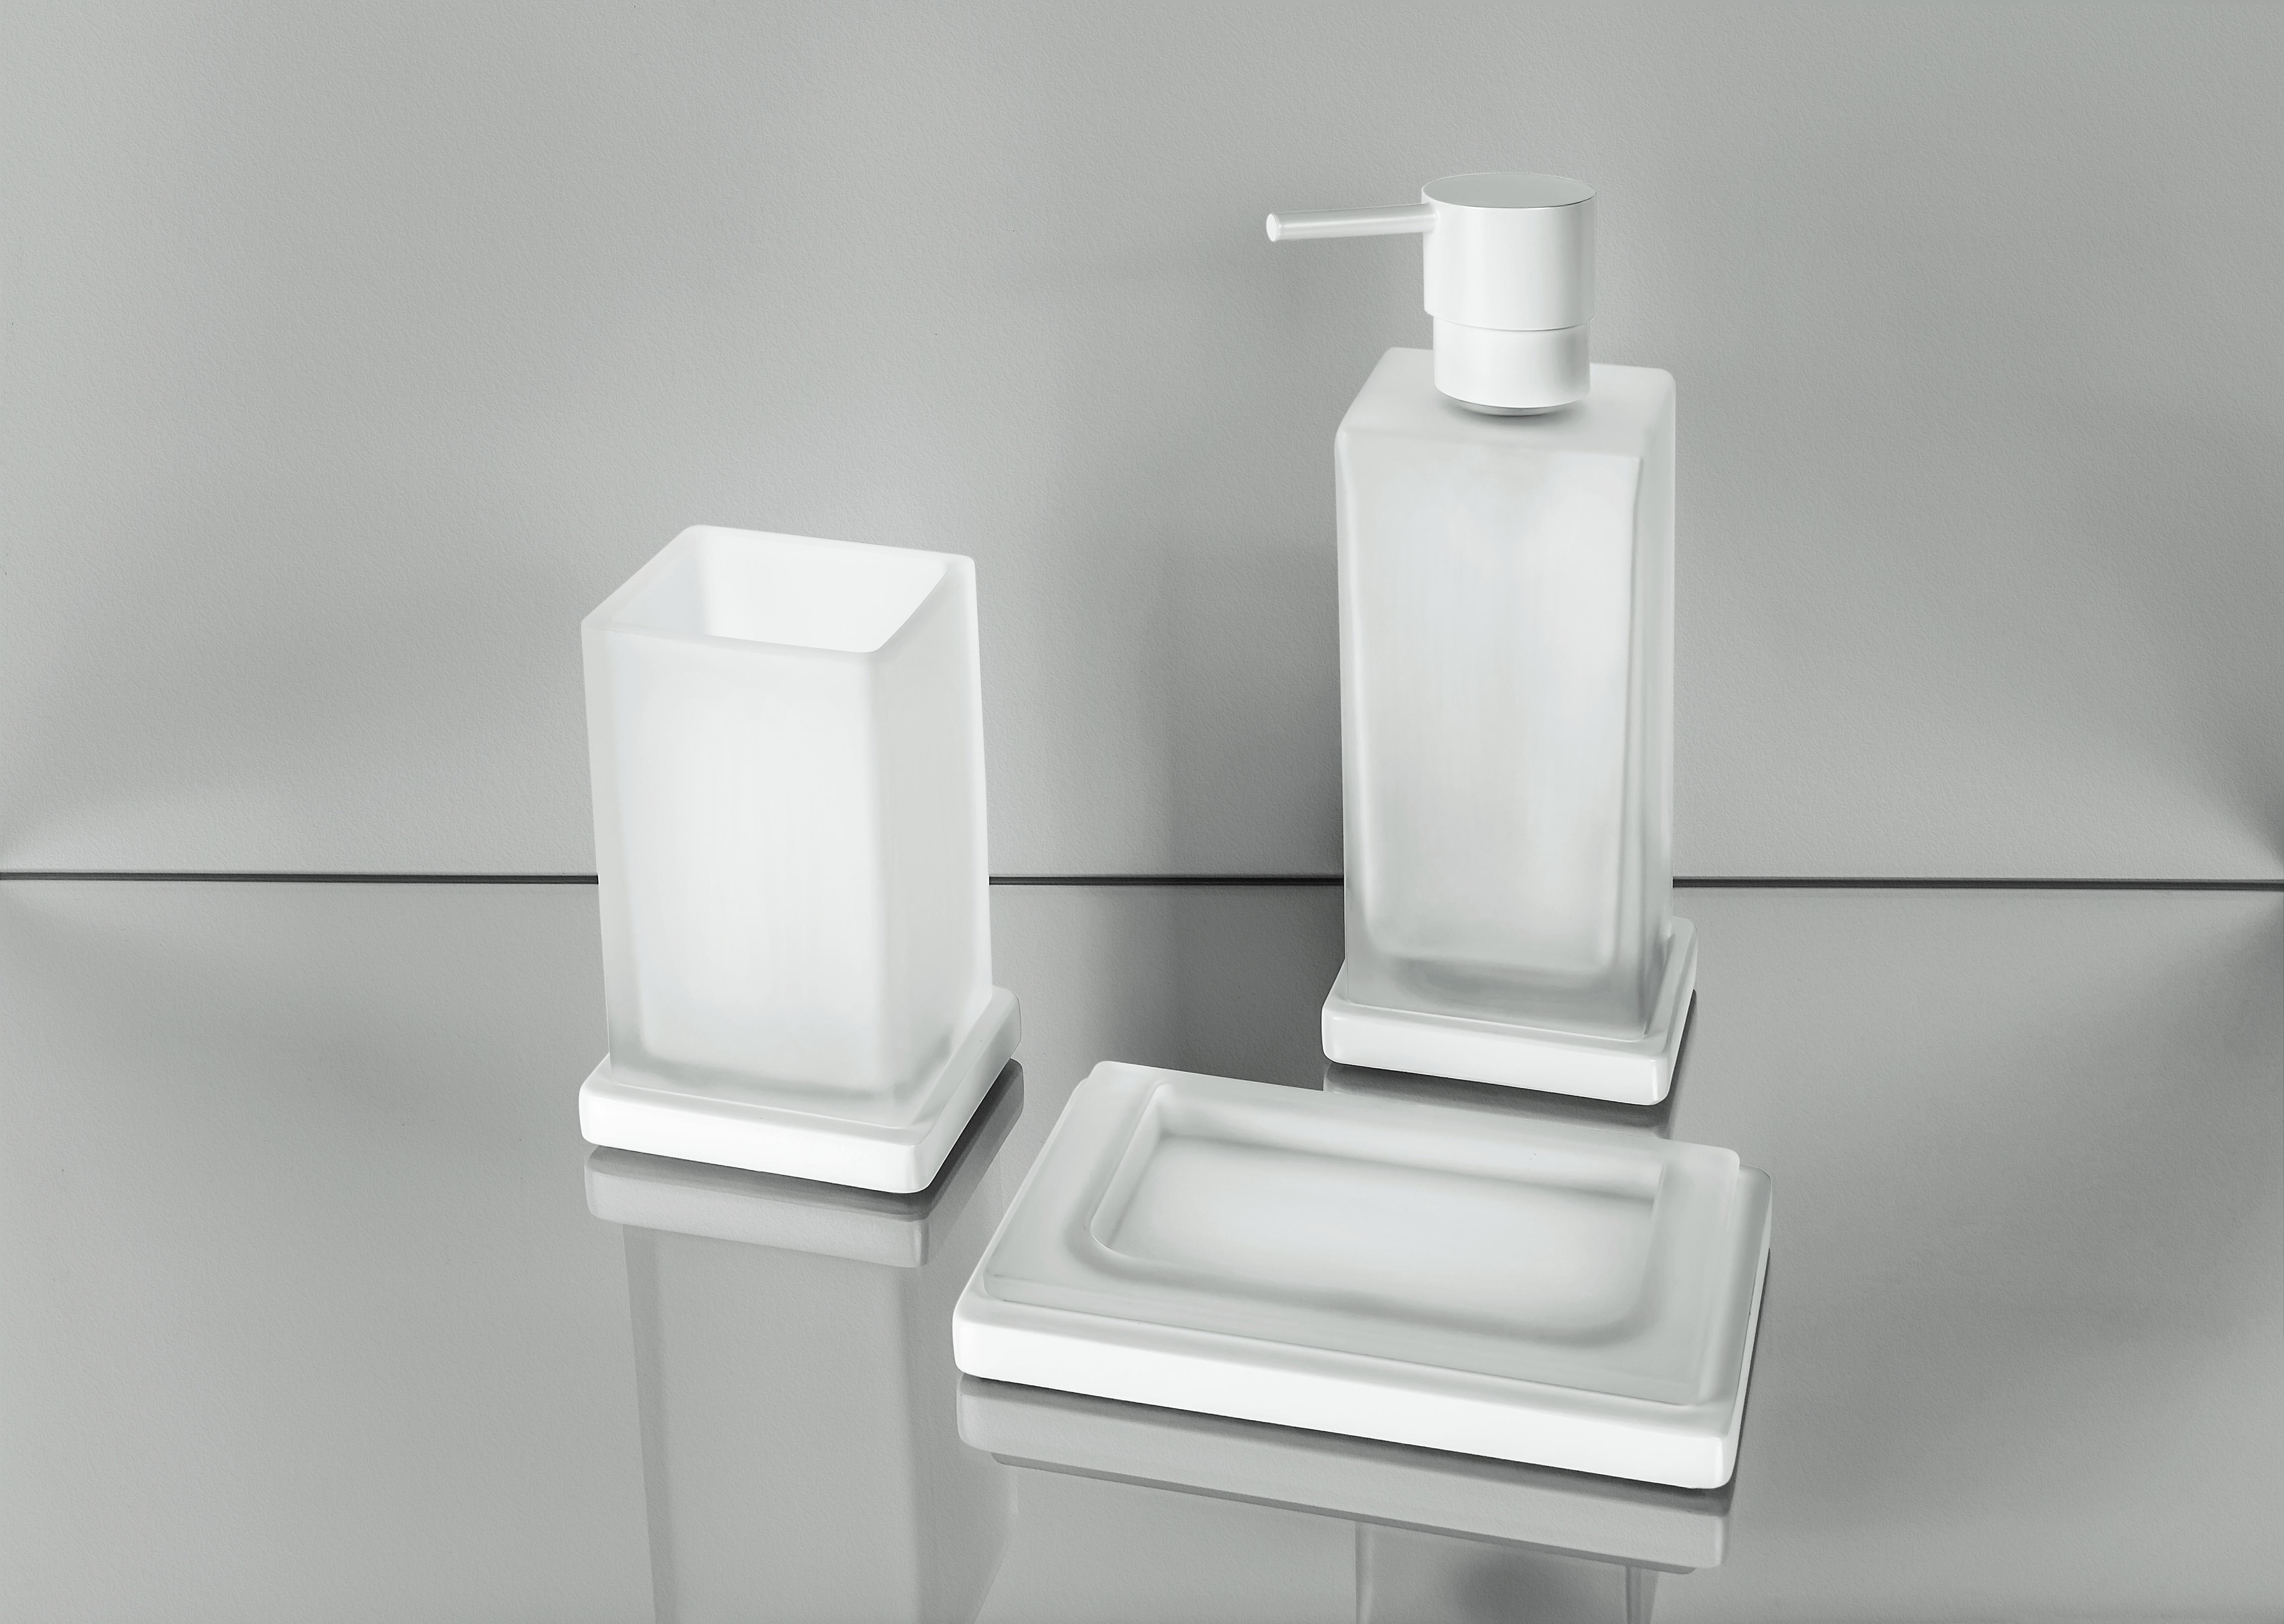 Porta bicchiere B1641 - portasapone B1640 - Spandisapone B9317